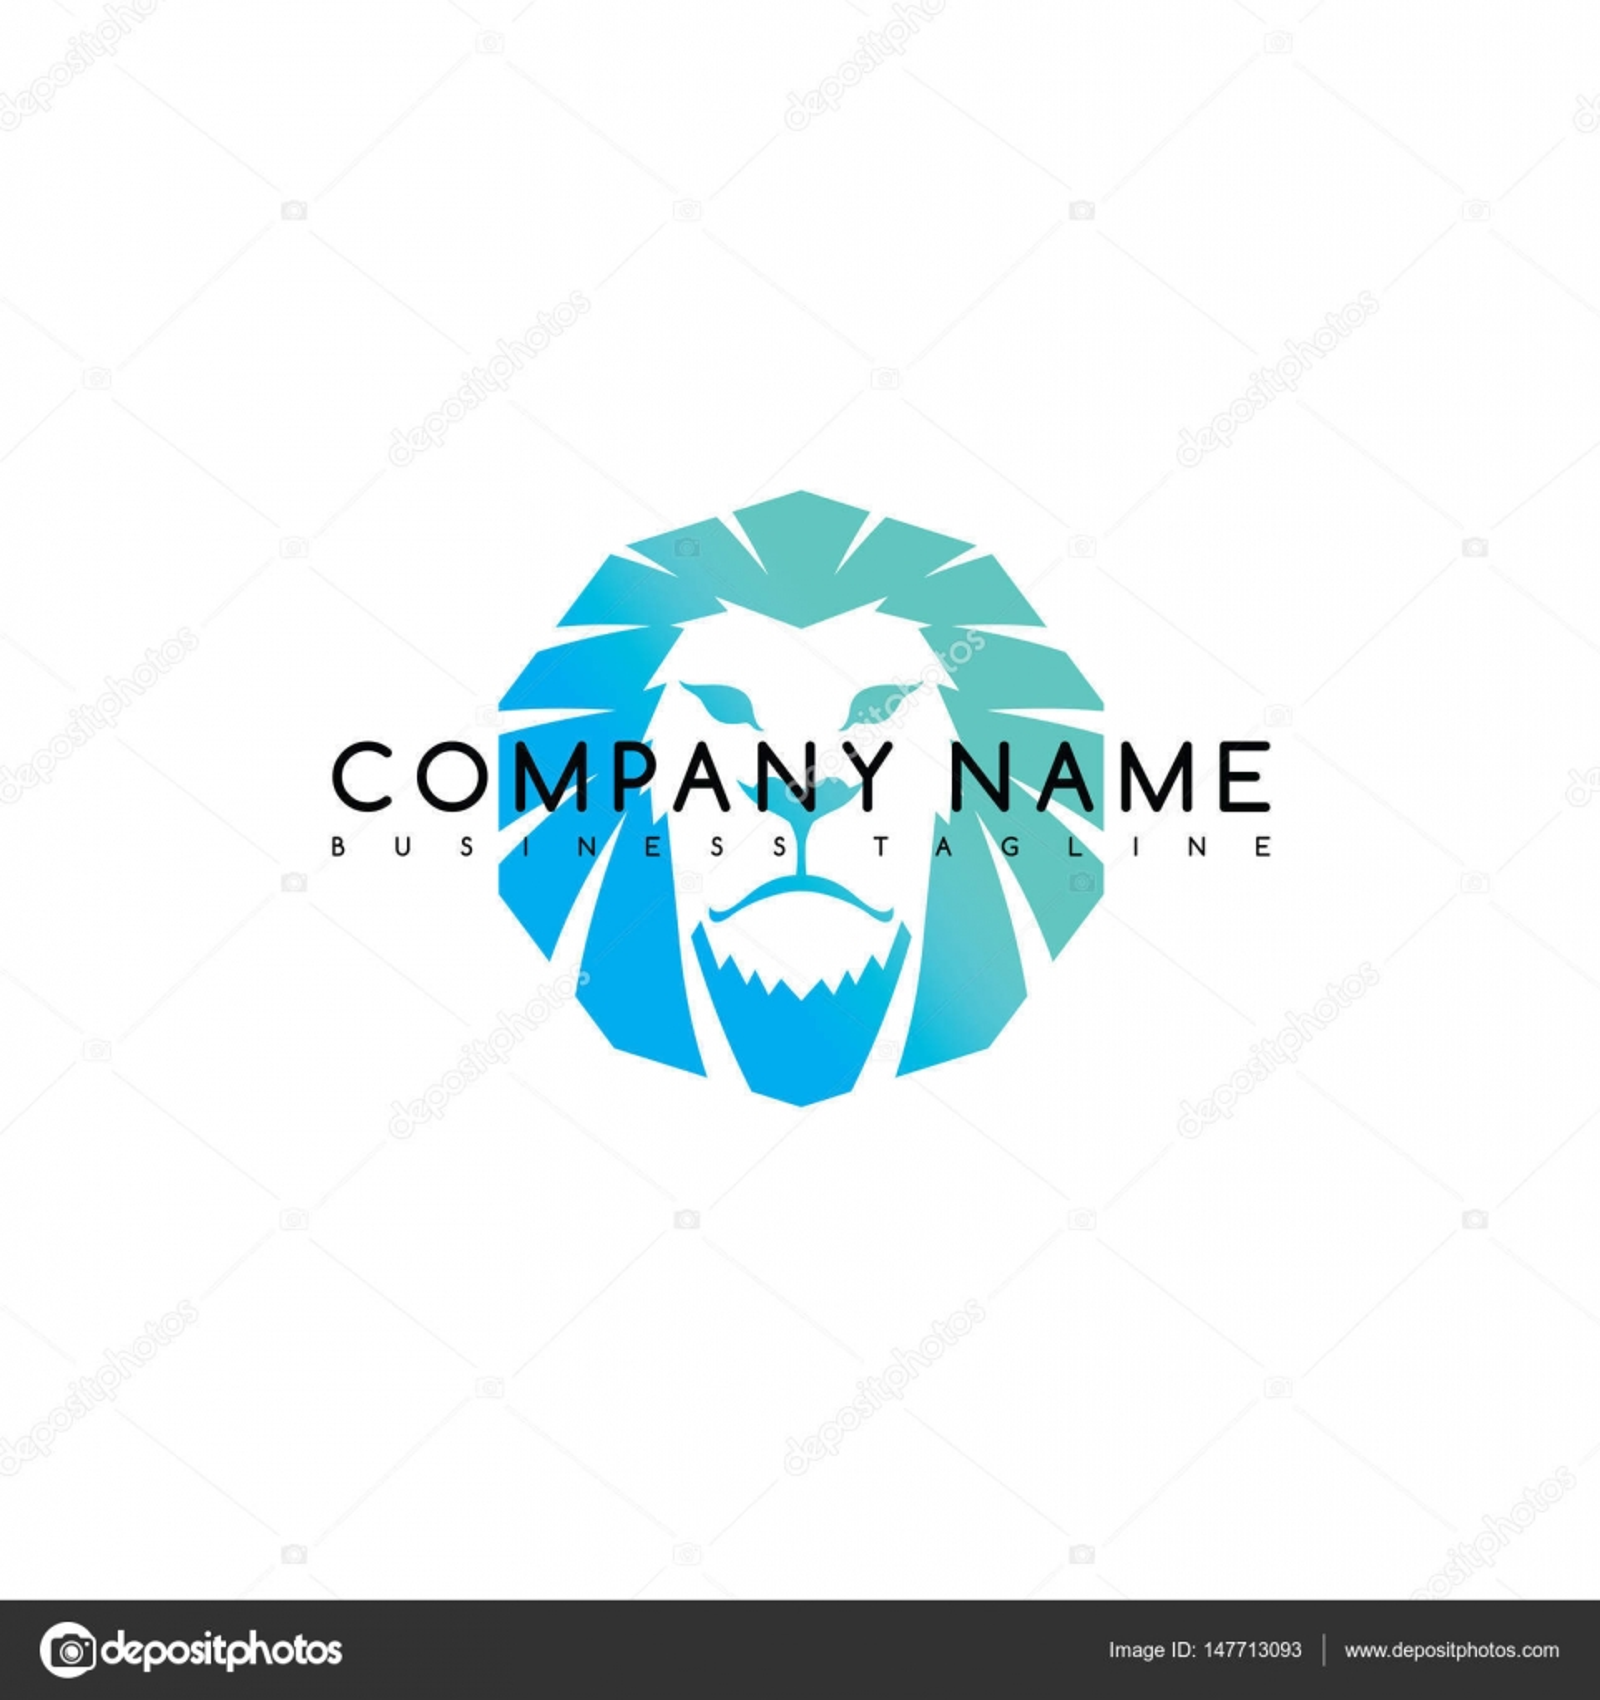 Company name business tagline stock vector vectorfirst 147713093 company name business tagline stock vector 147713093 buycottarizona